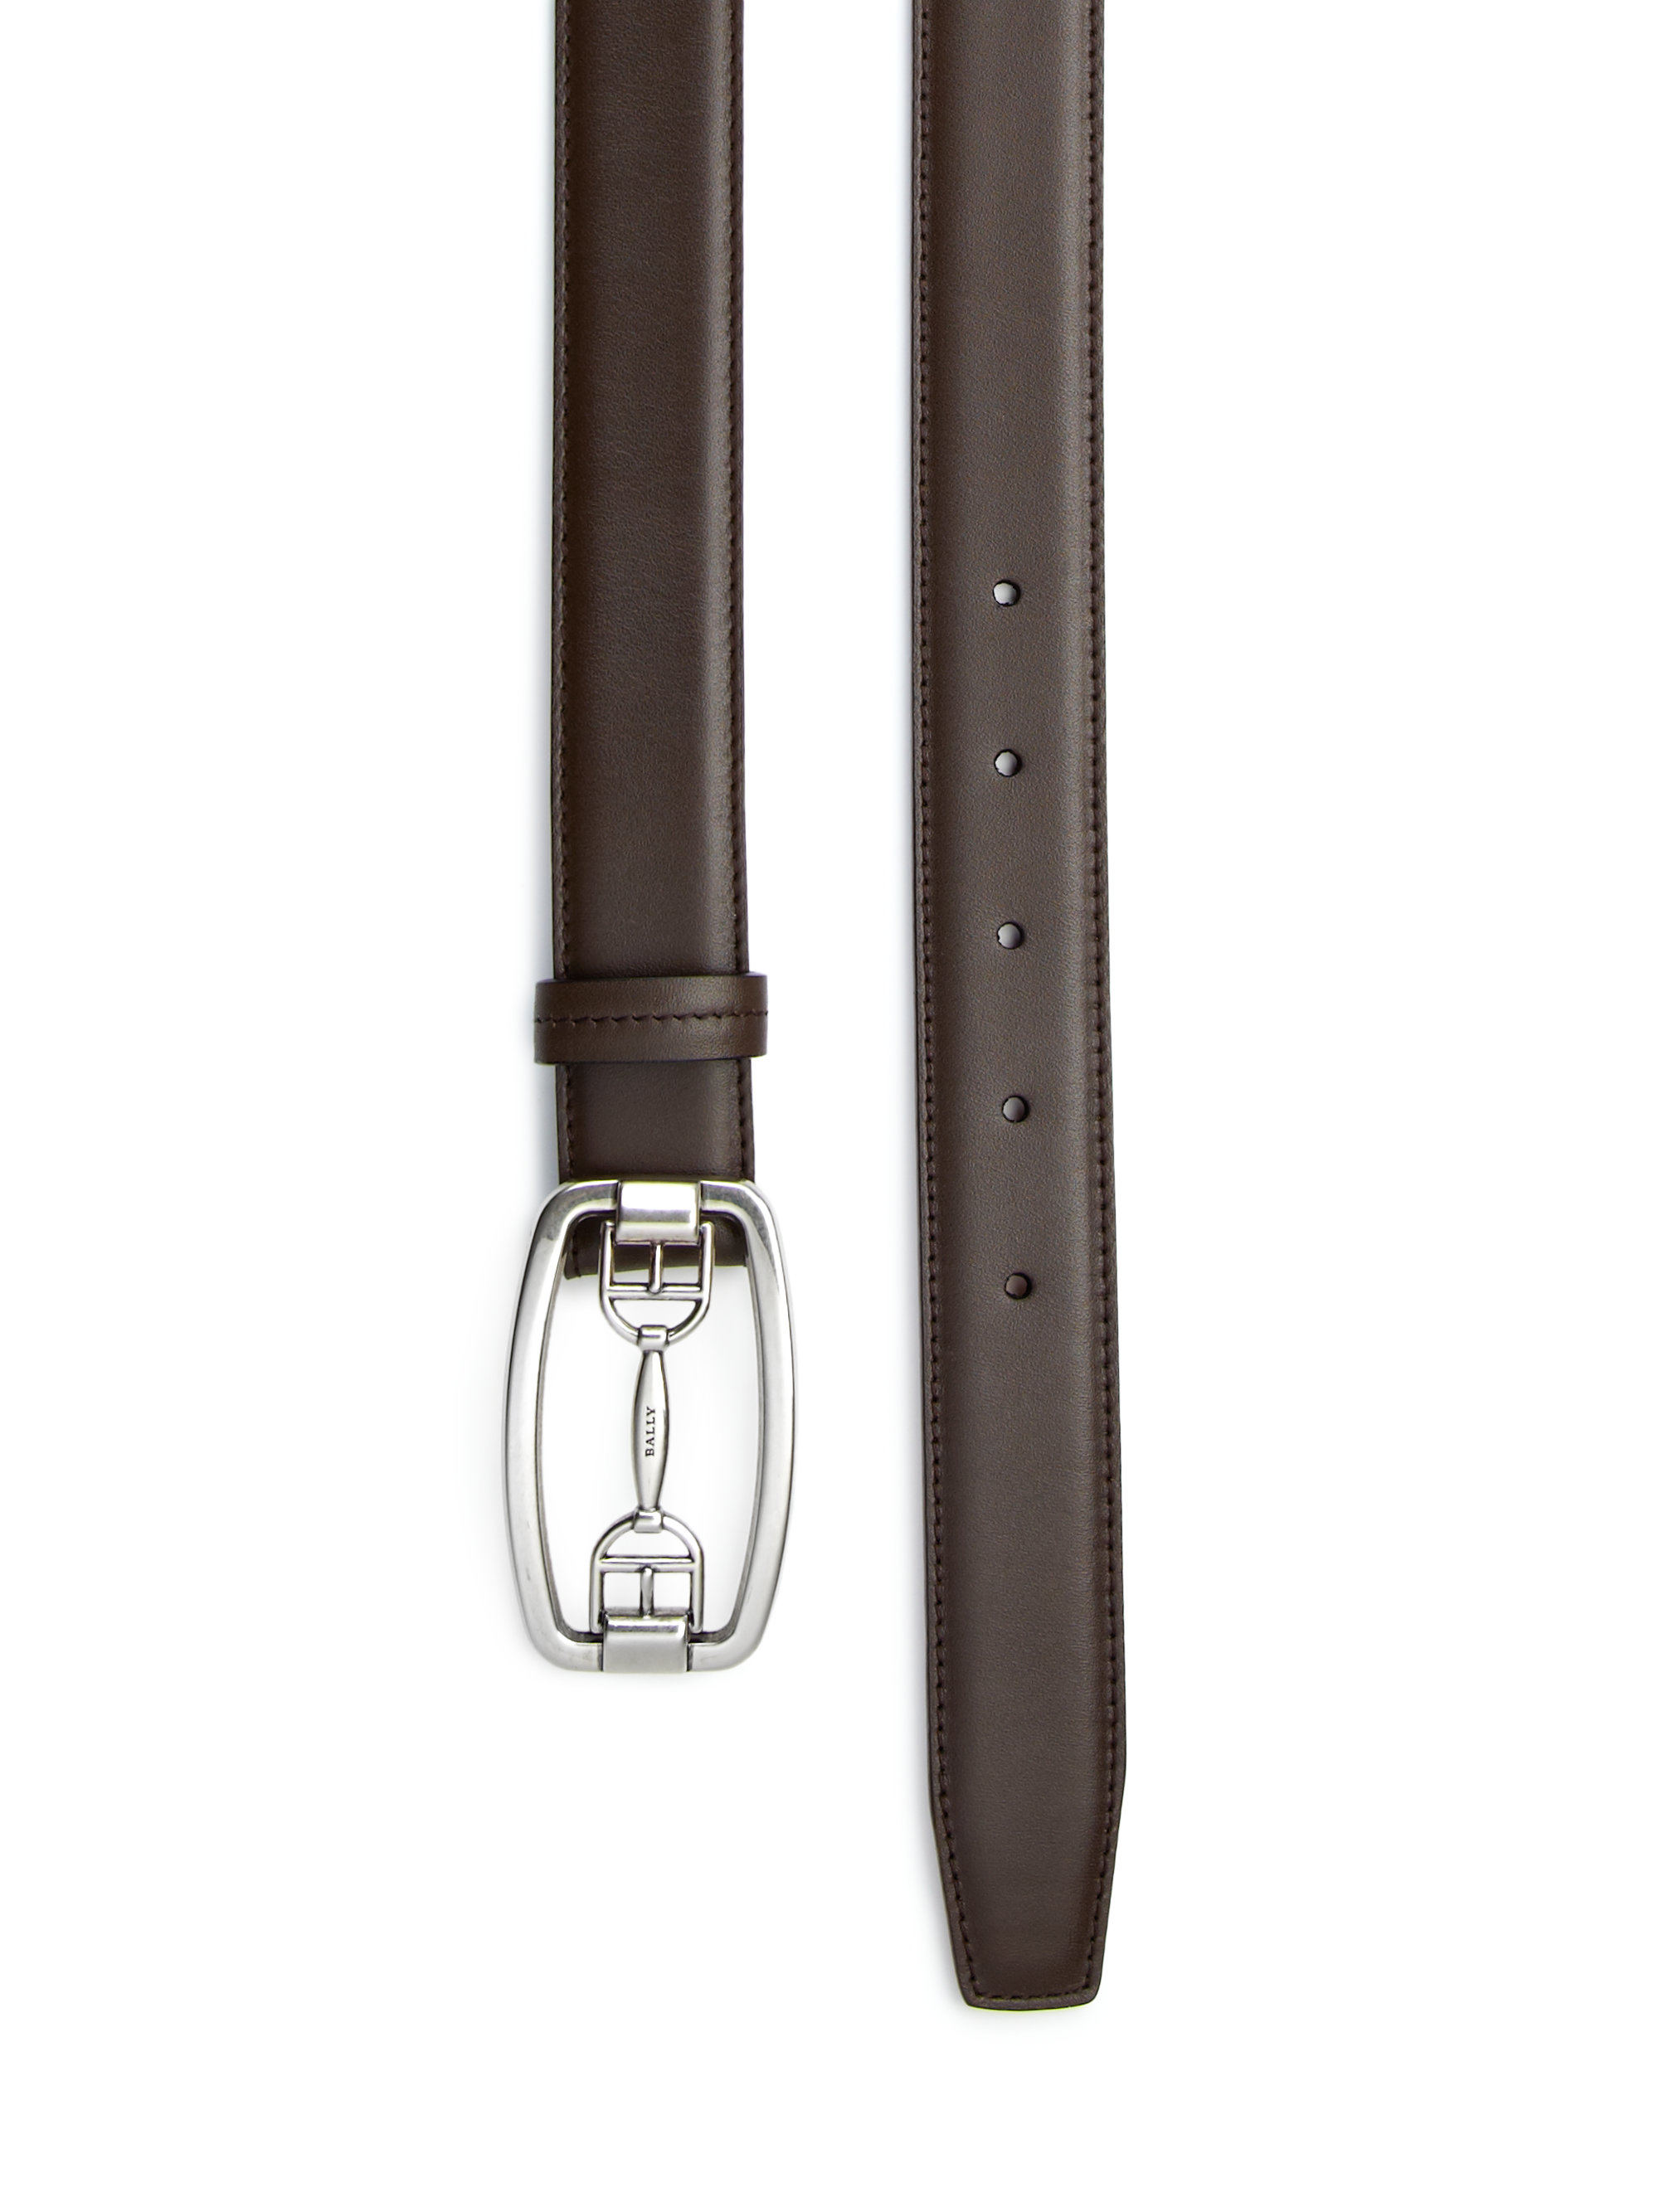 Bally Cornell Leather Bit Dress Belt In Brown For Men Lyst